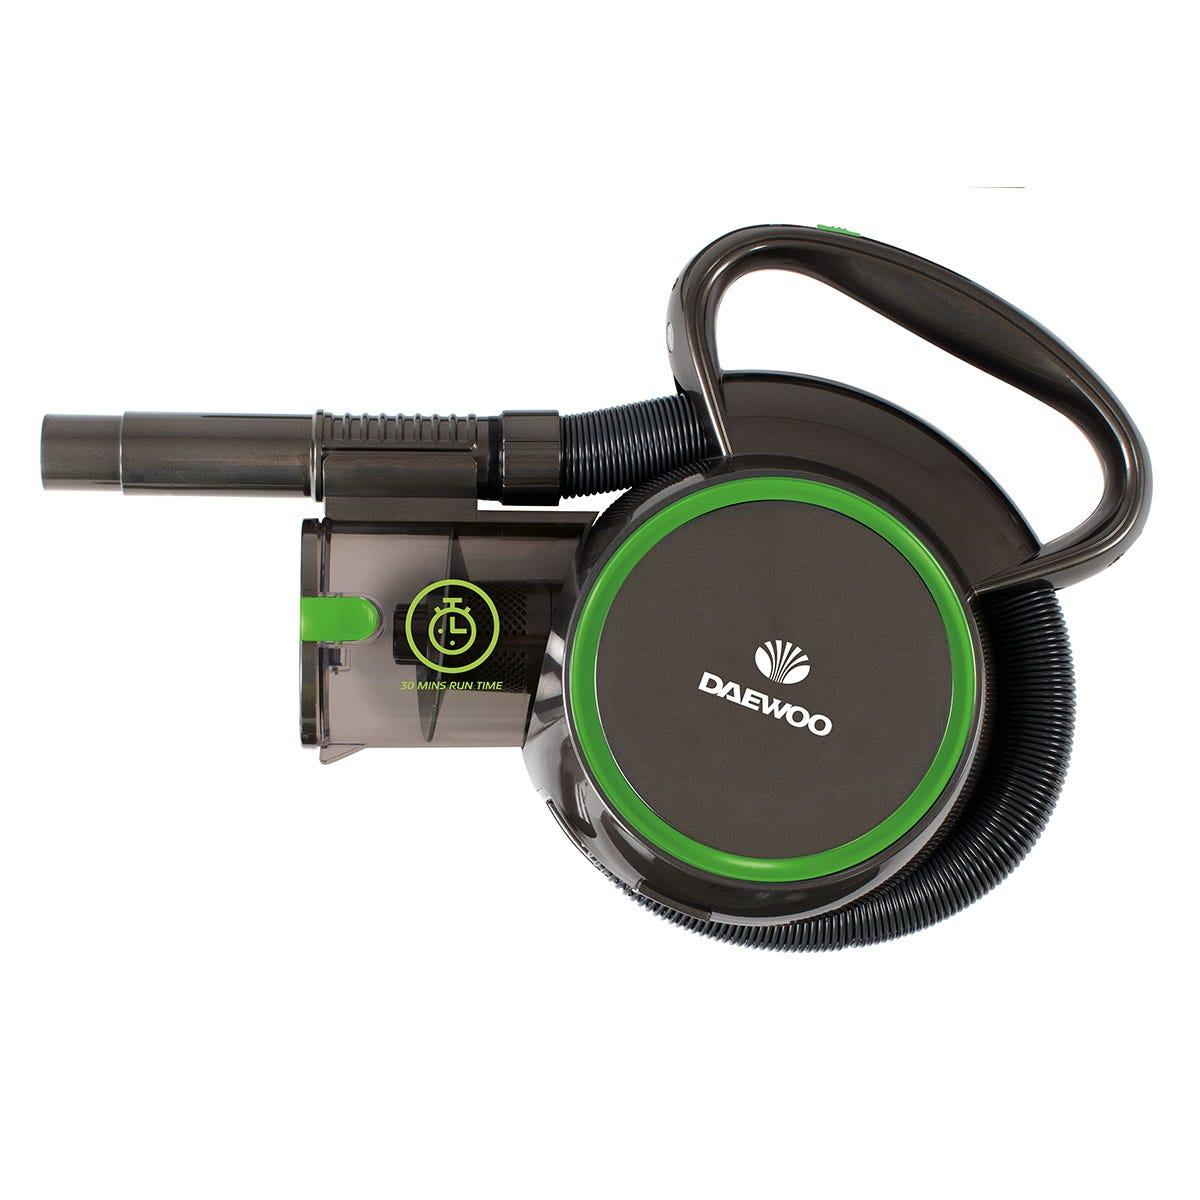 Daewoo FLR00013GE Compact Pro 18.5V Flexi-Hose Handheld Vacuum Cleaner - Grey, Green, and Black